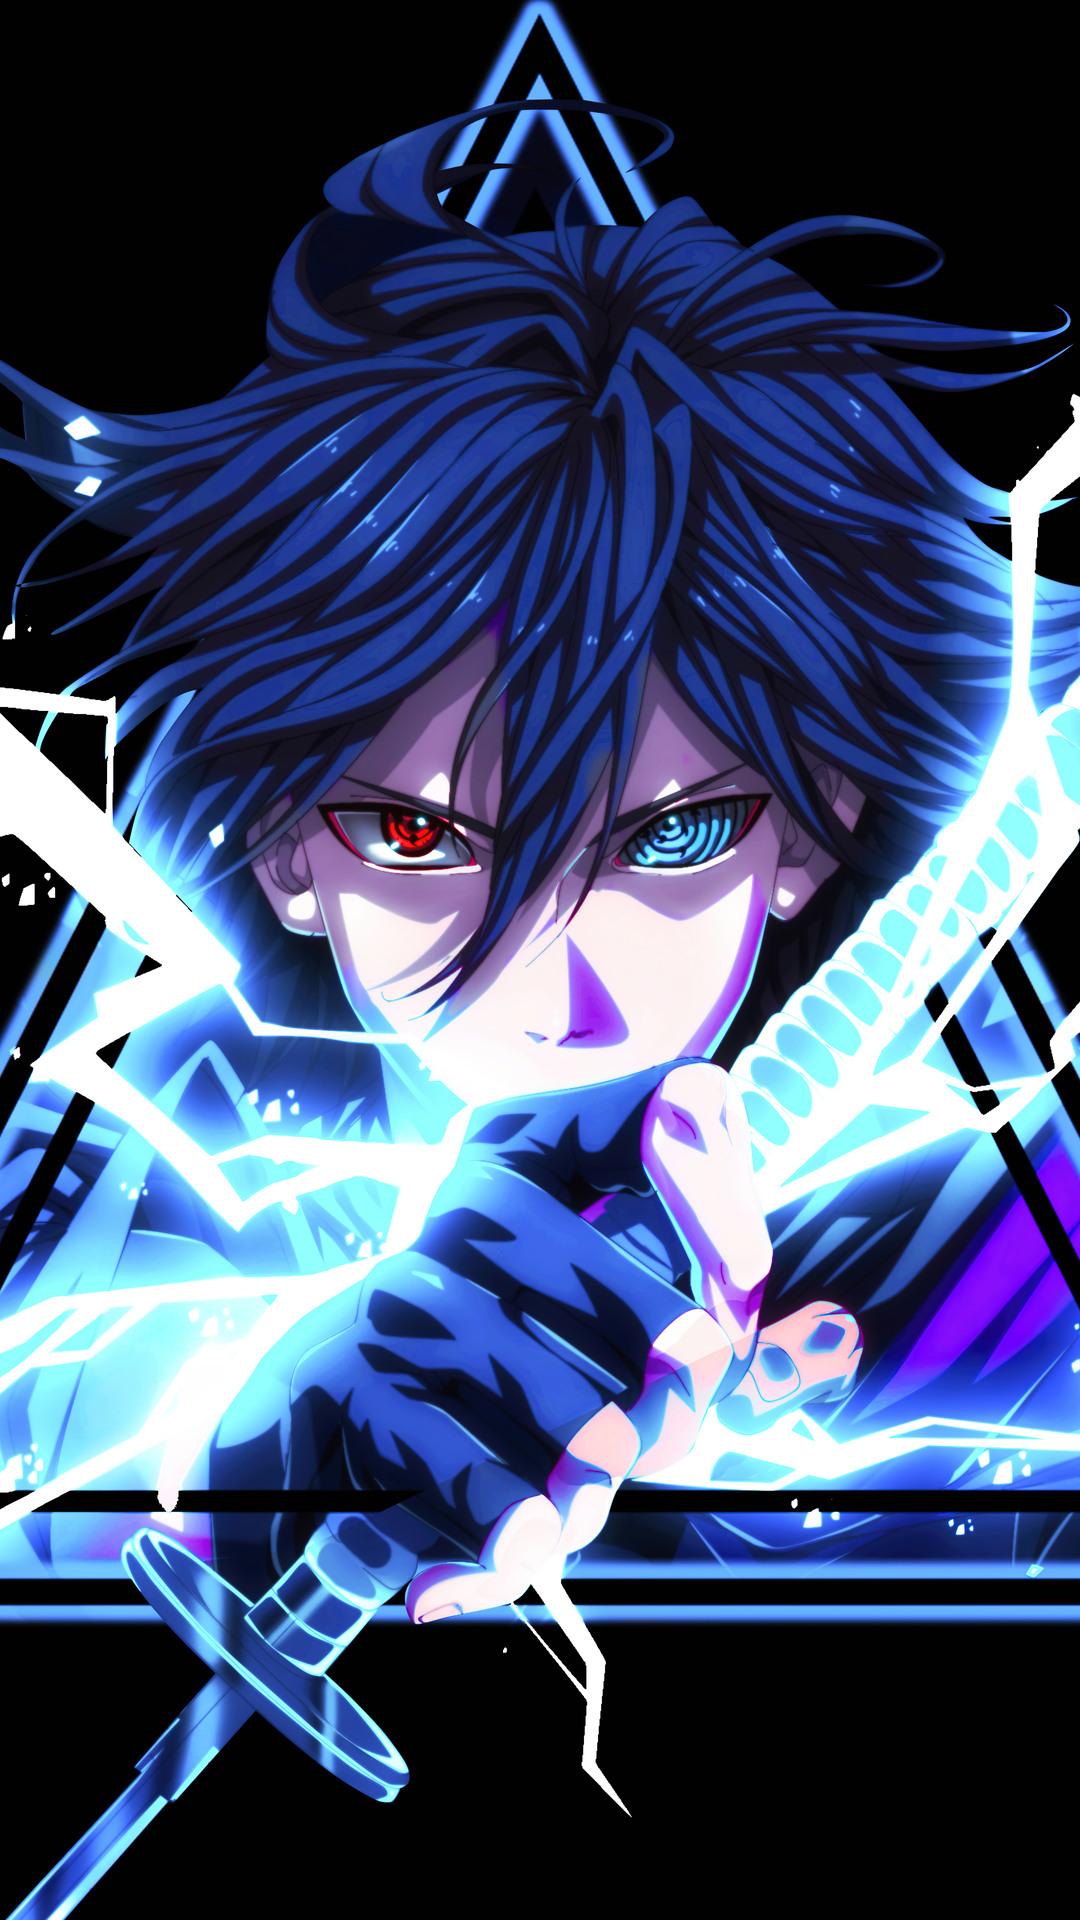 Sasuke Uchiha Sharingan Rinnegan Eyes Lightning Katana